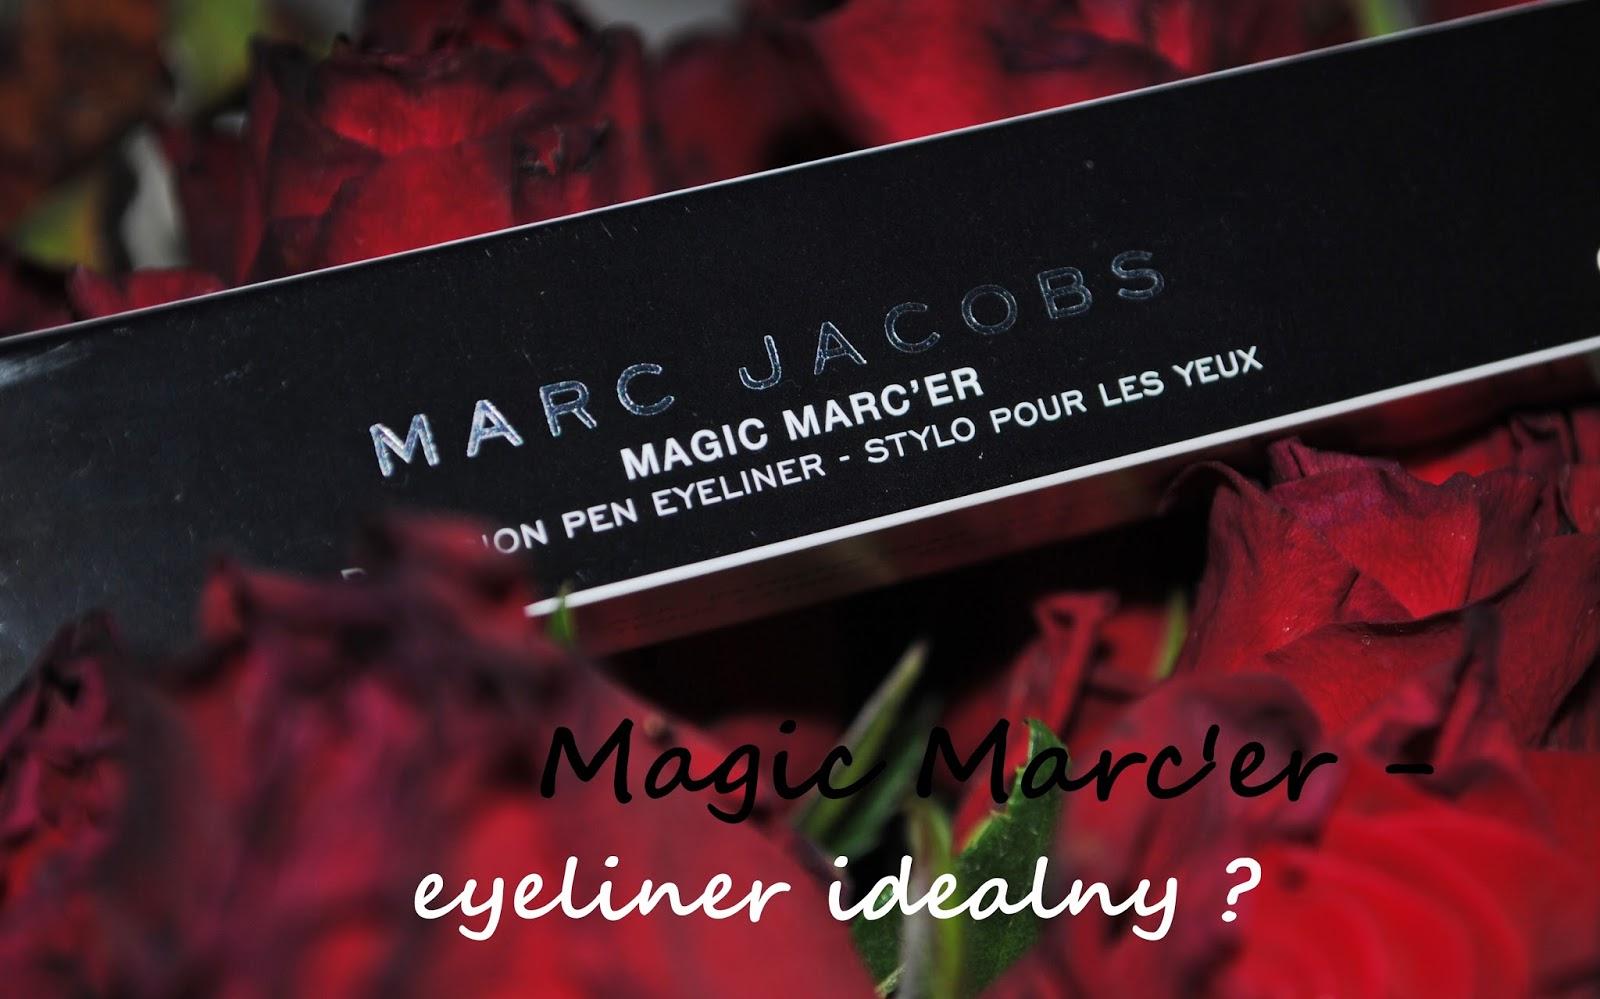 Magic Marc'er- eyeliner od Marca Jacobsa w kolorze Blacquer beautypediapatt.blogspot.com